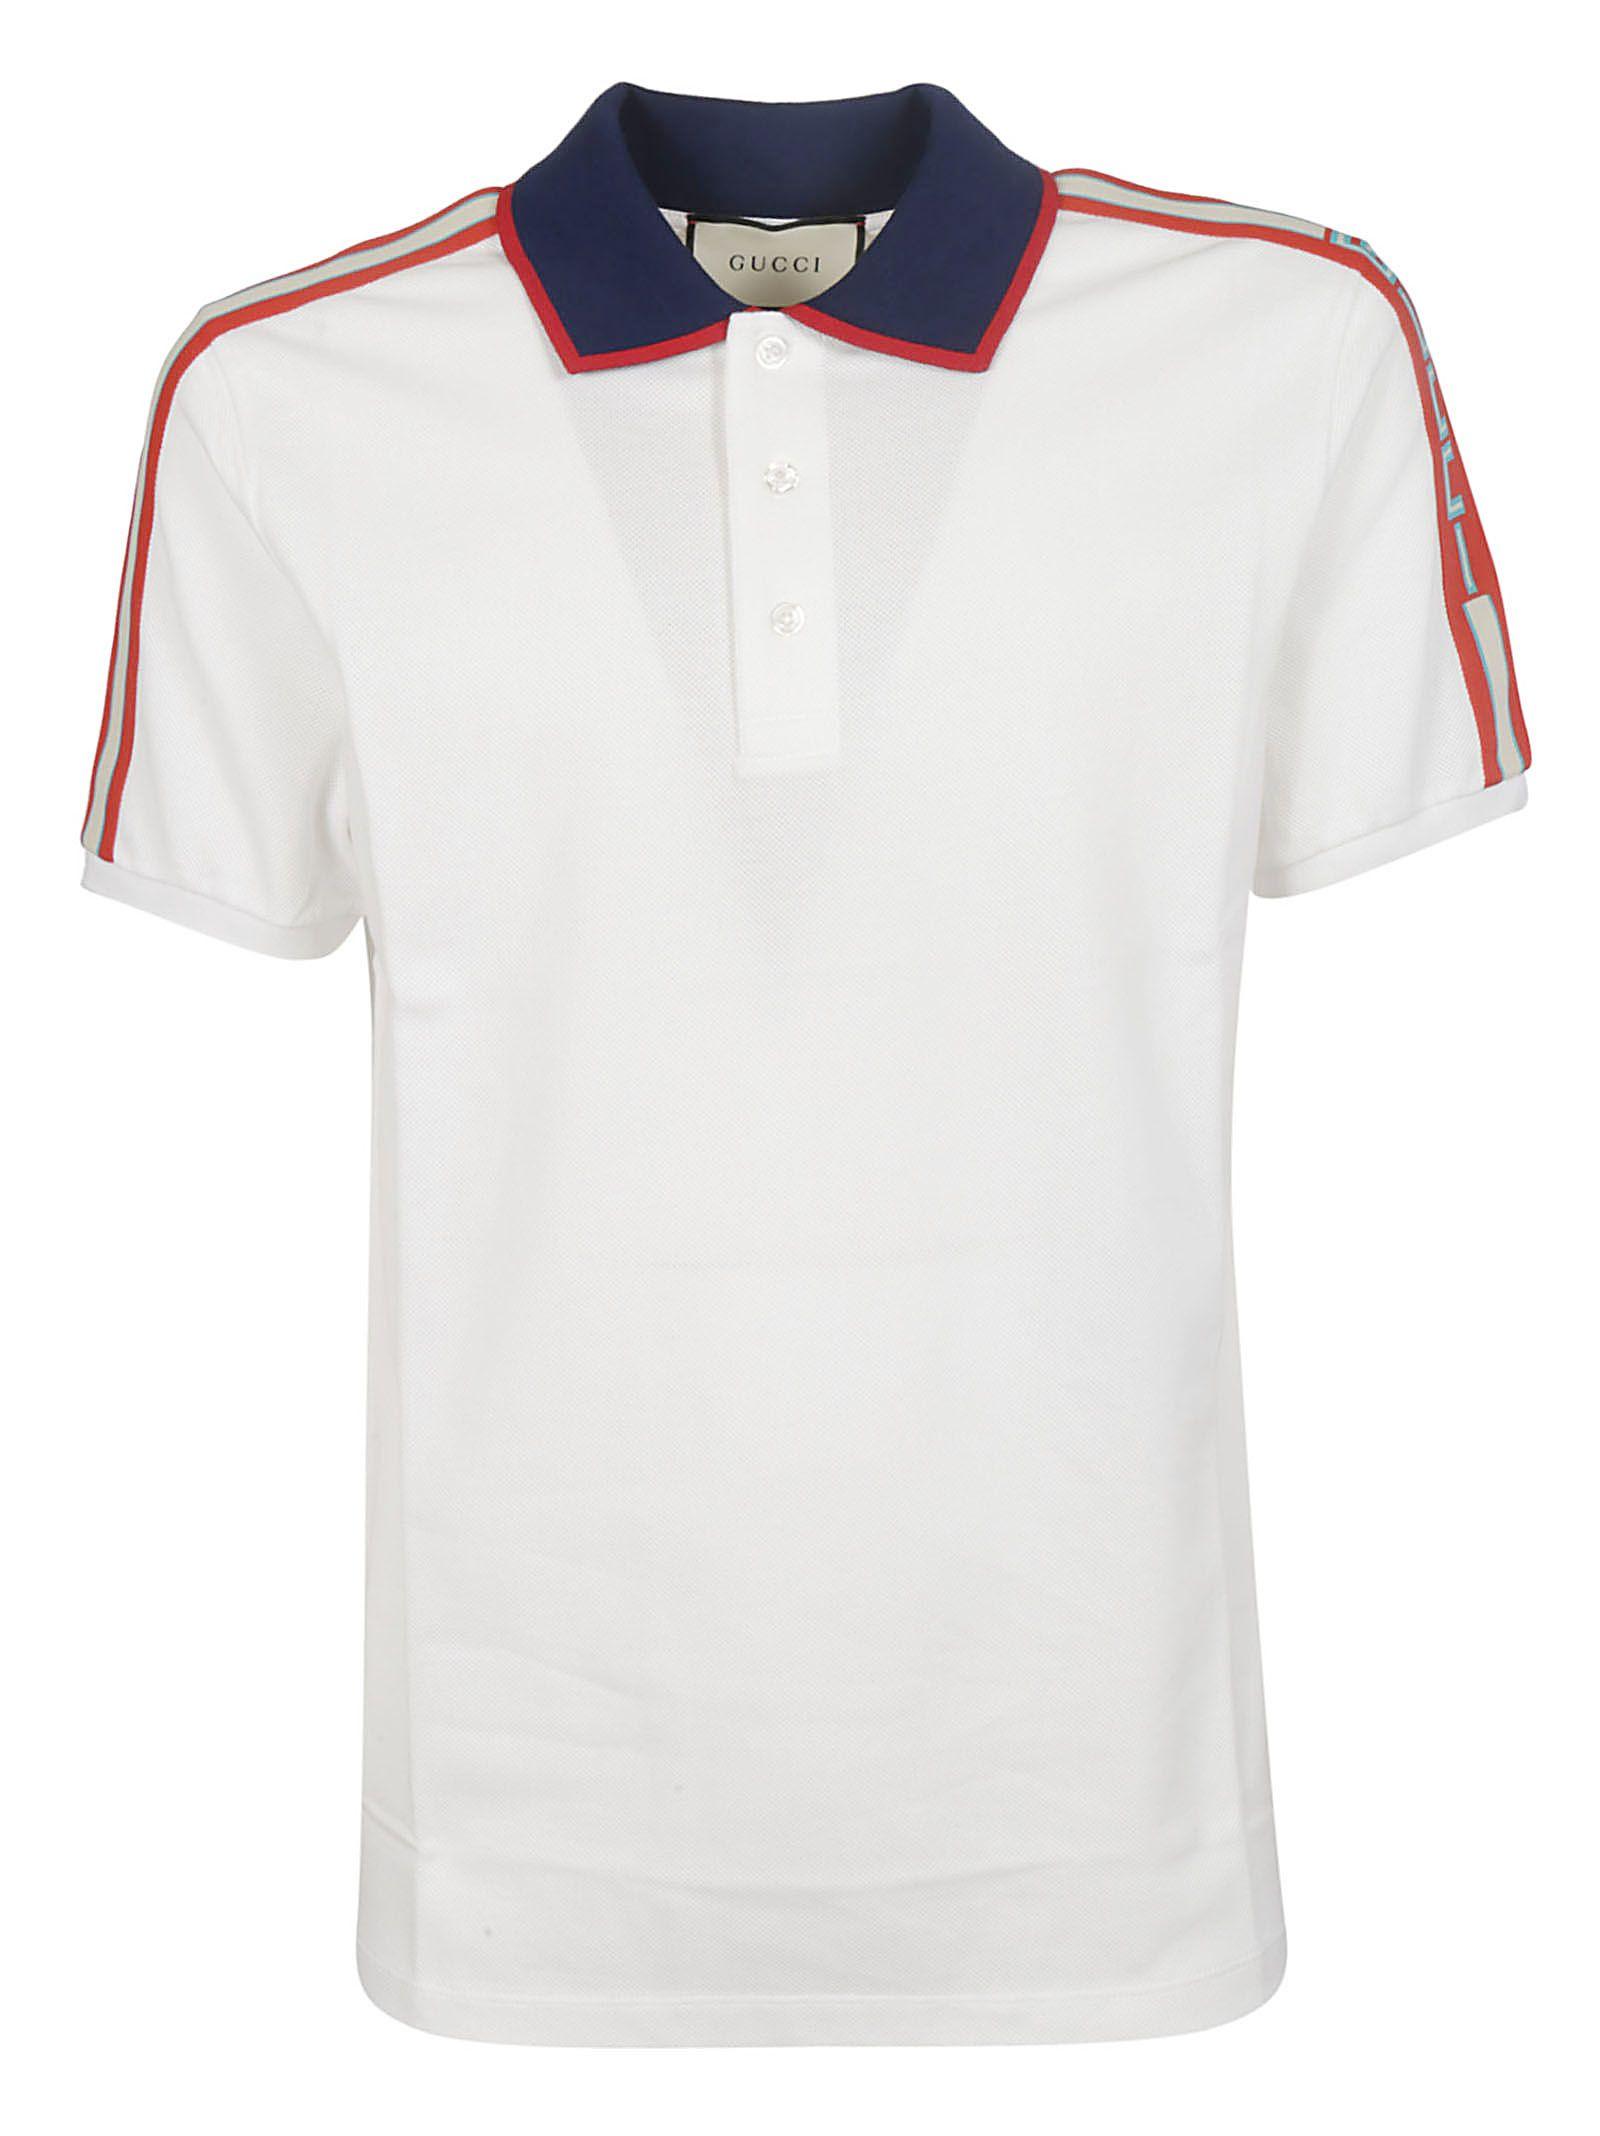 7e002e0965d85b Gucci Gucci Side Striped Polo Shirt - White - 10860137